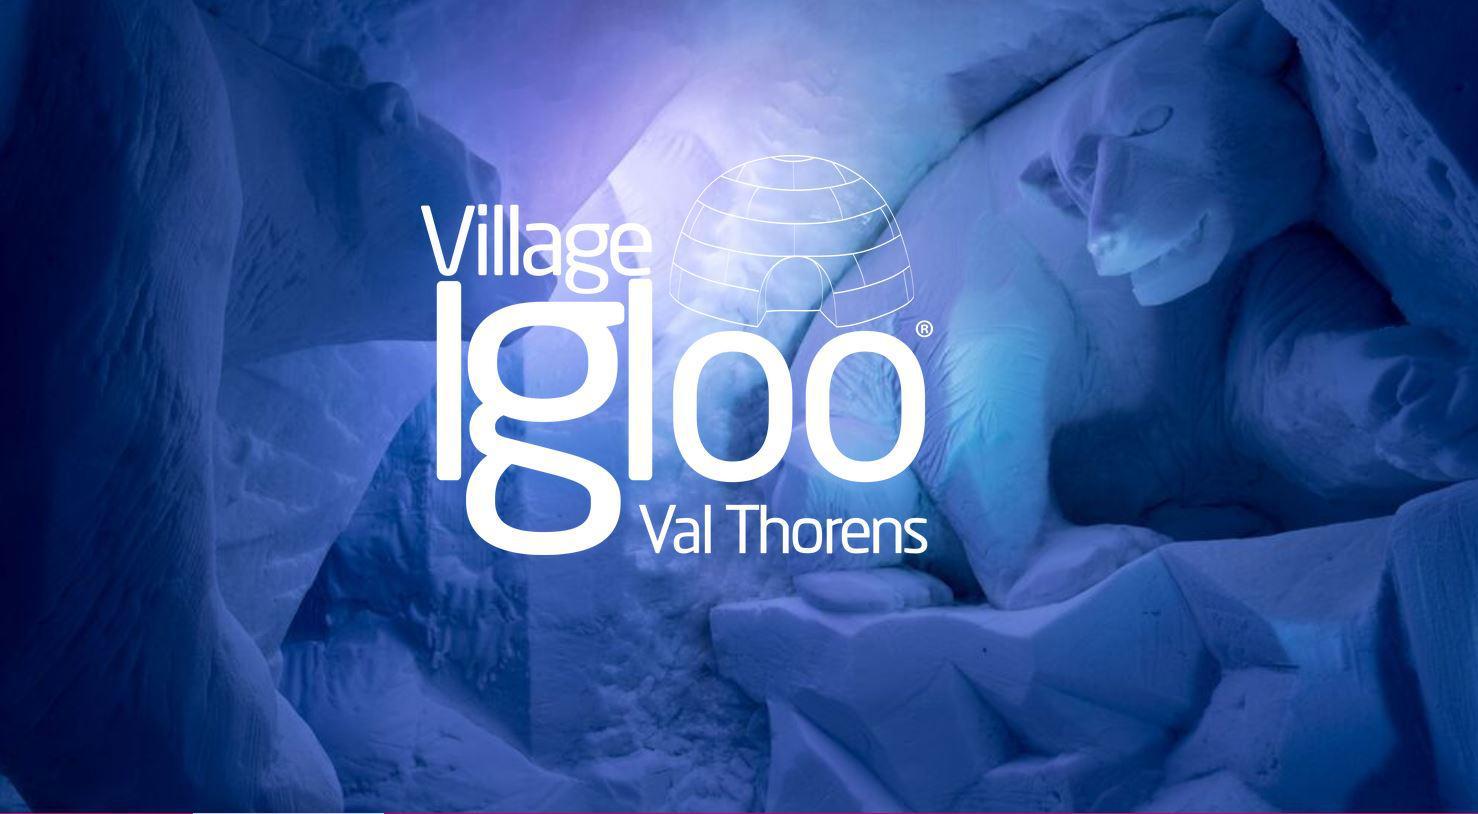 Un Village Igloo à Val Thorens